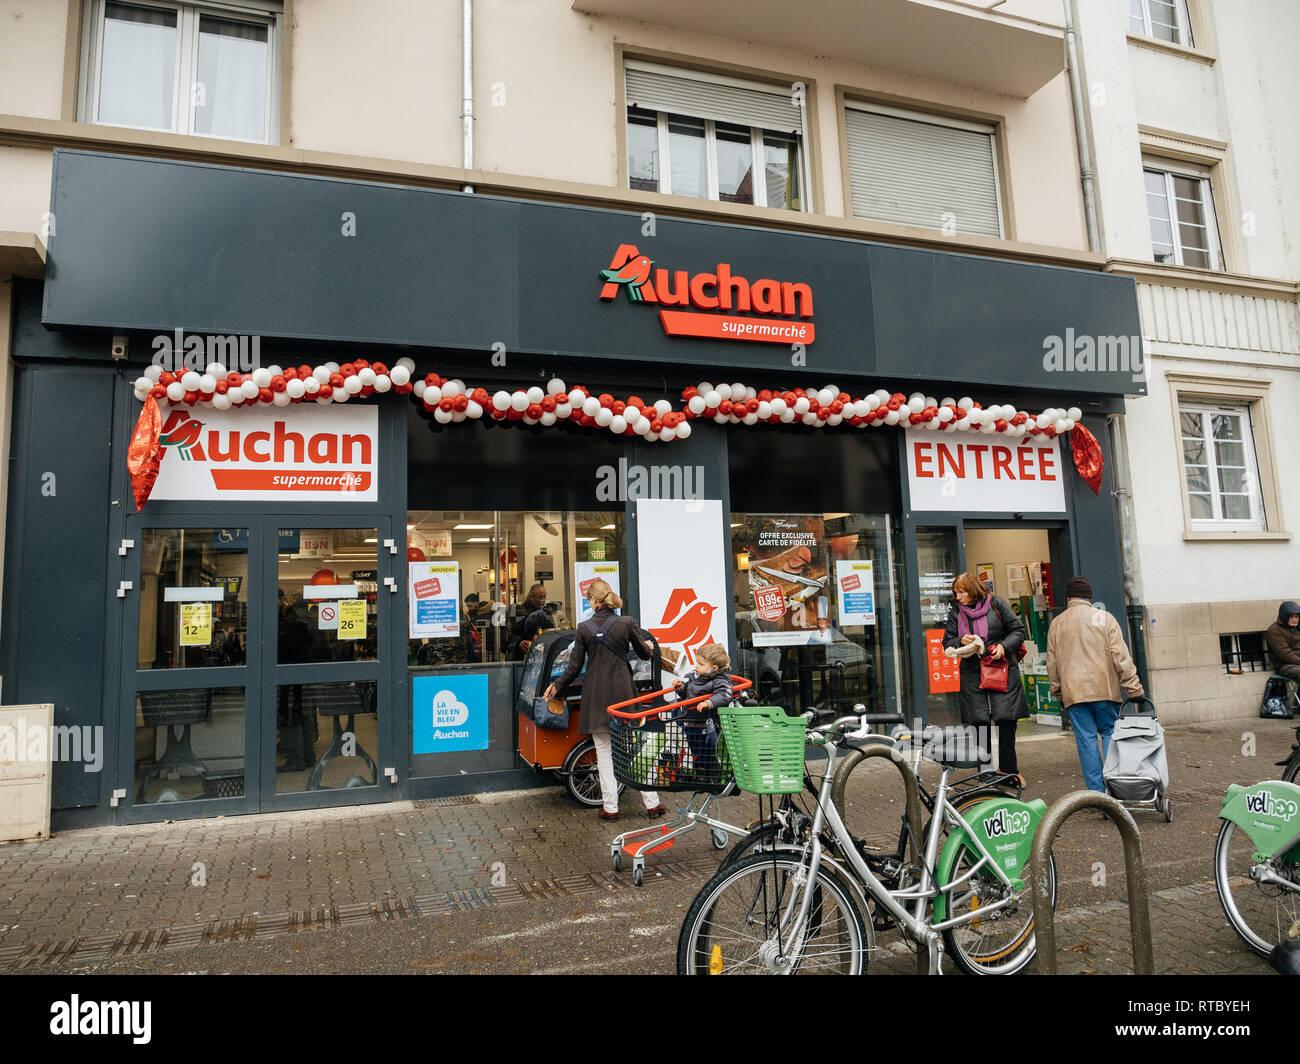 carte simply market auchan STRASBOURG, FRANCE   DEC 4, 2017: Auchan Supermarket entrance in